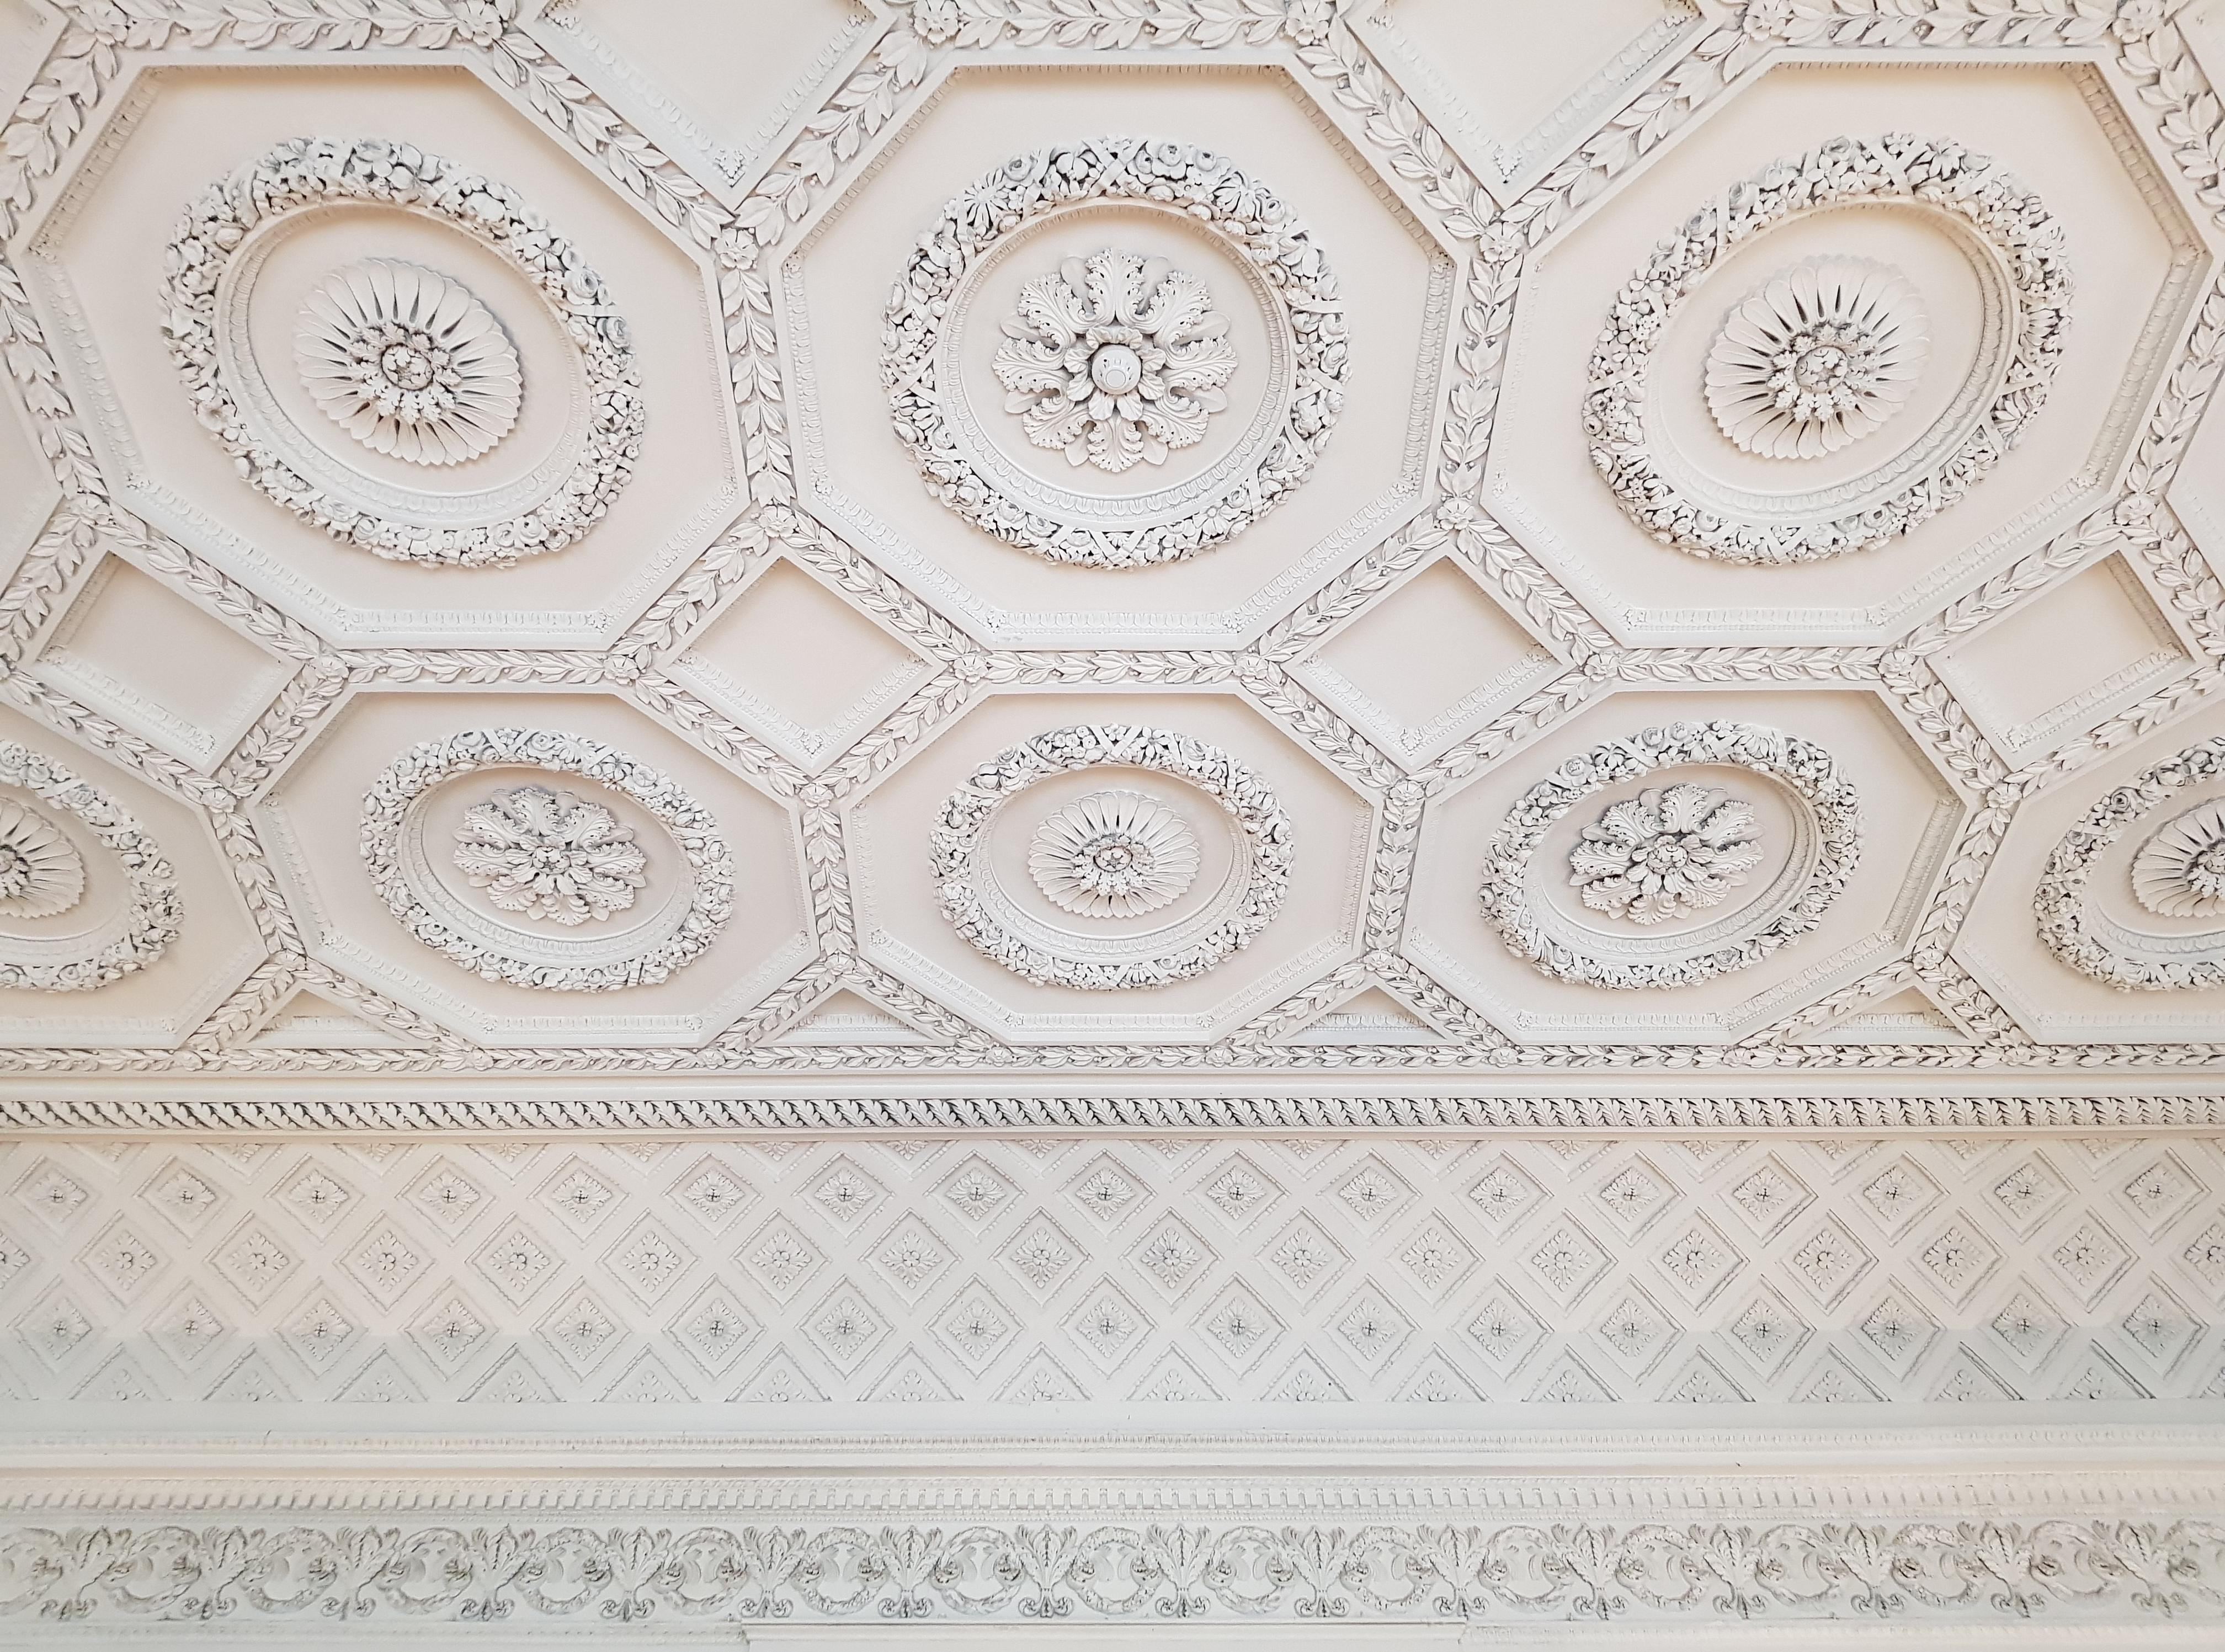 Plasterwork « The Irish Aesthete